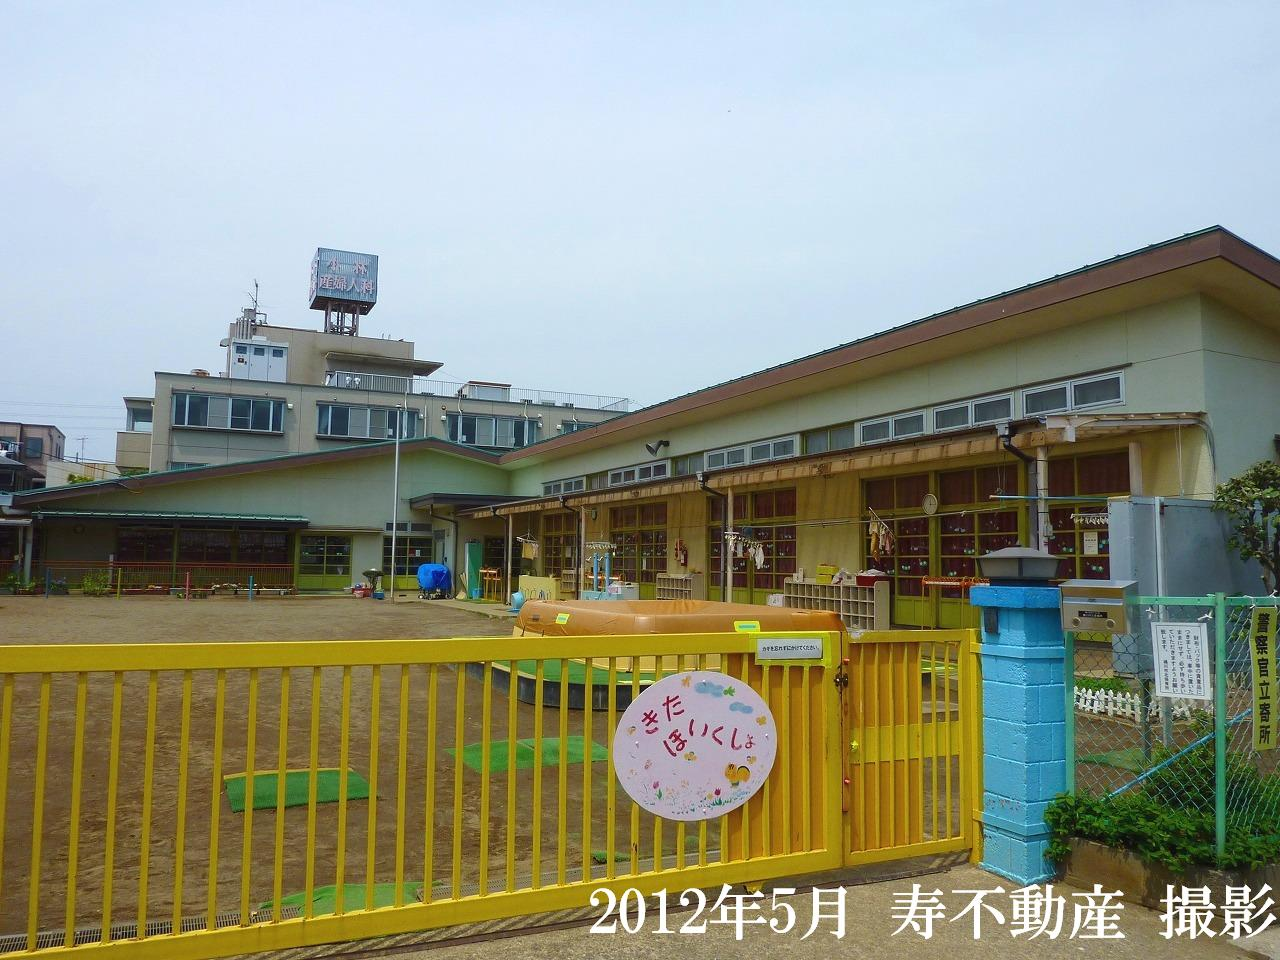 幼稚園・保育園 桶川市北保育所(幼稚園・保育園)まで476m